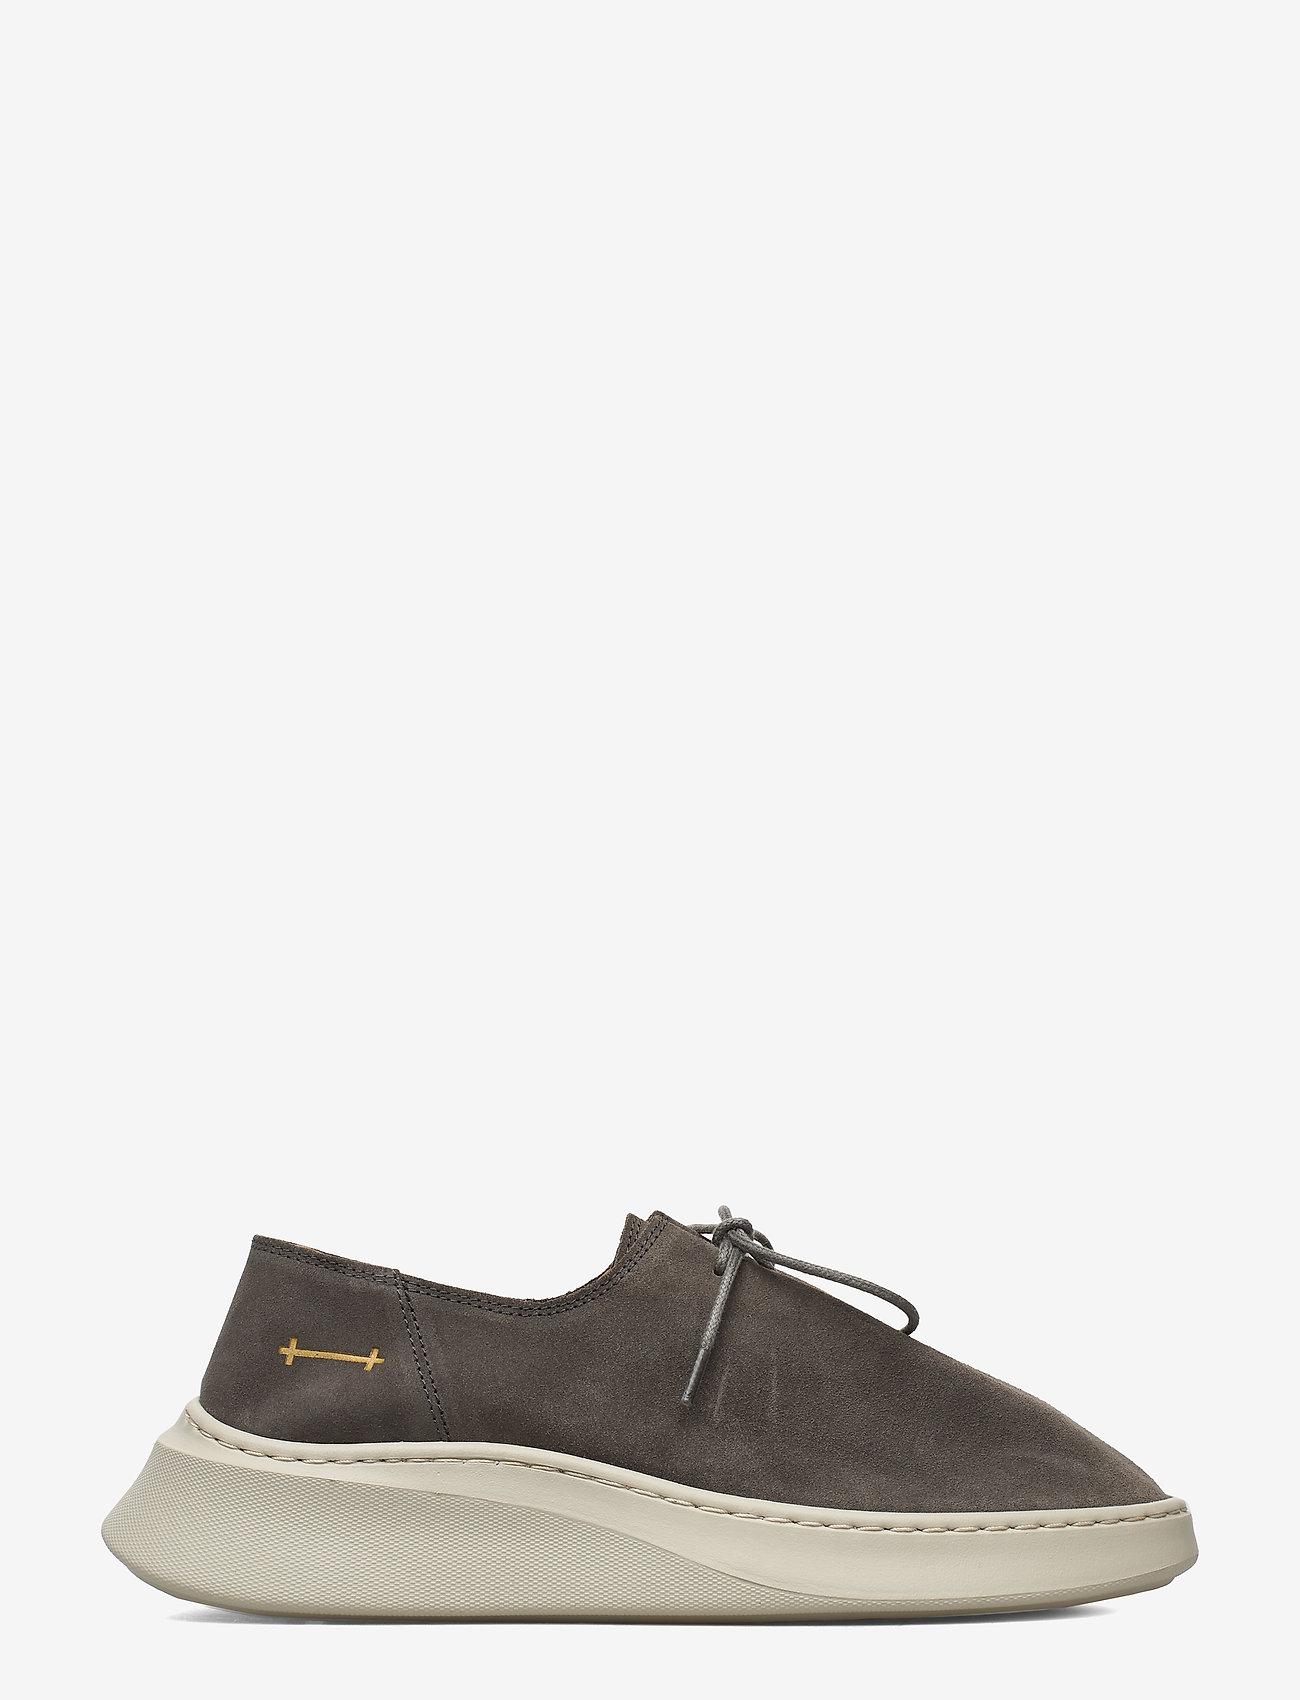 Gram - yatfai sneaker sage suede - buty sznurowane - sage - 1